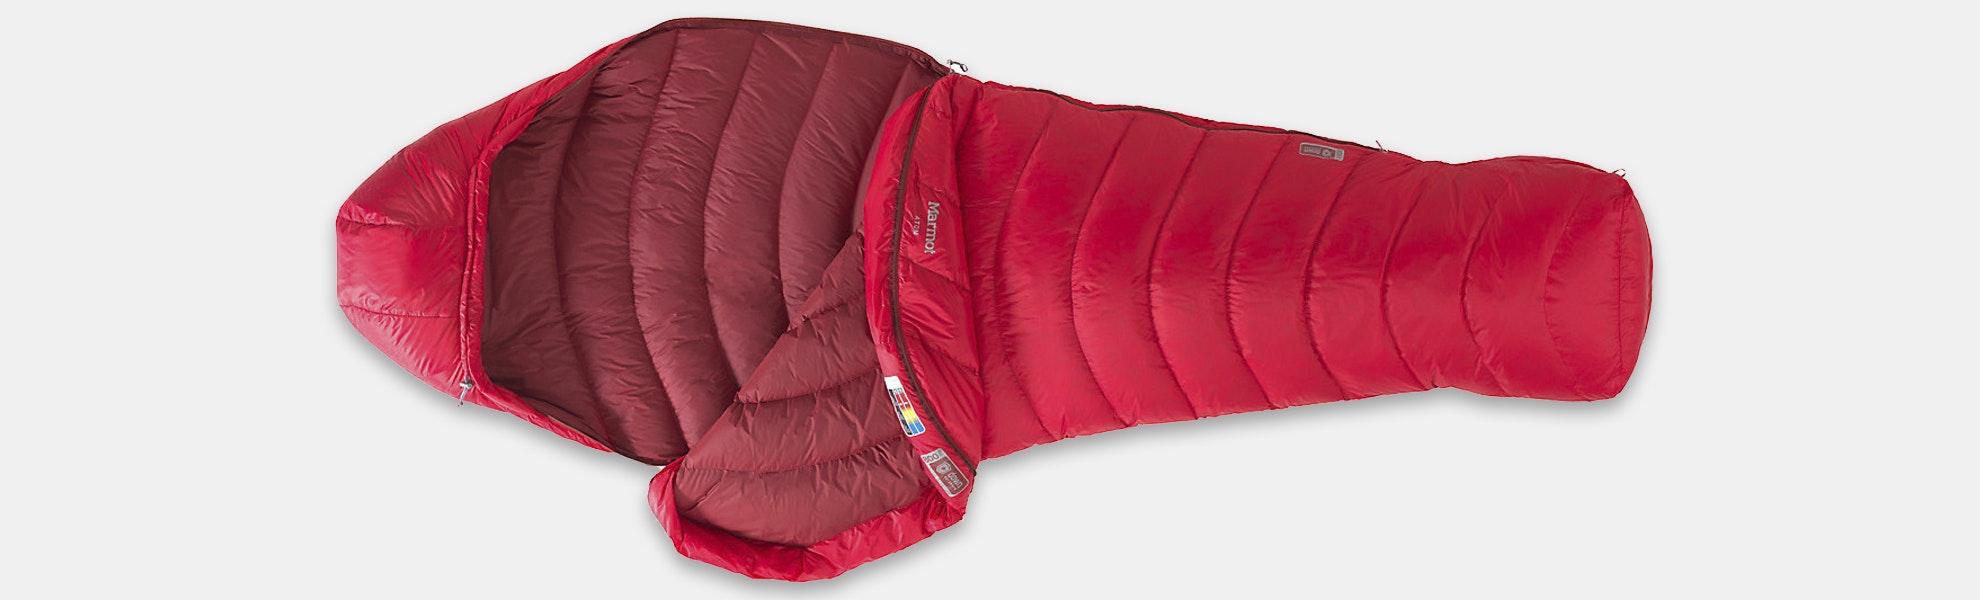 Marmot Atom 40-Degree Sleeping Bag